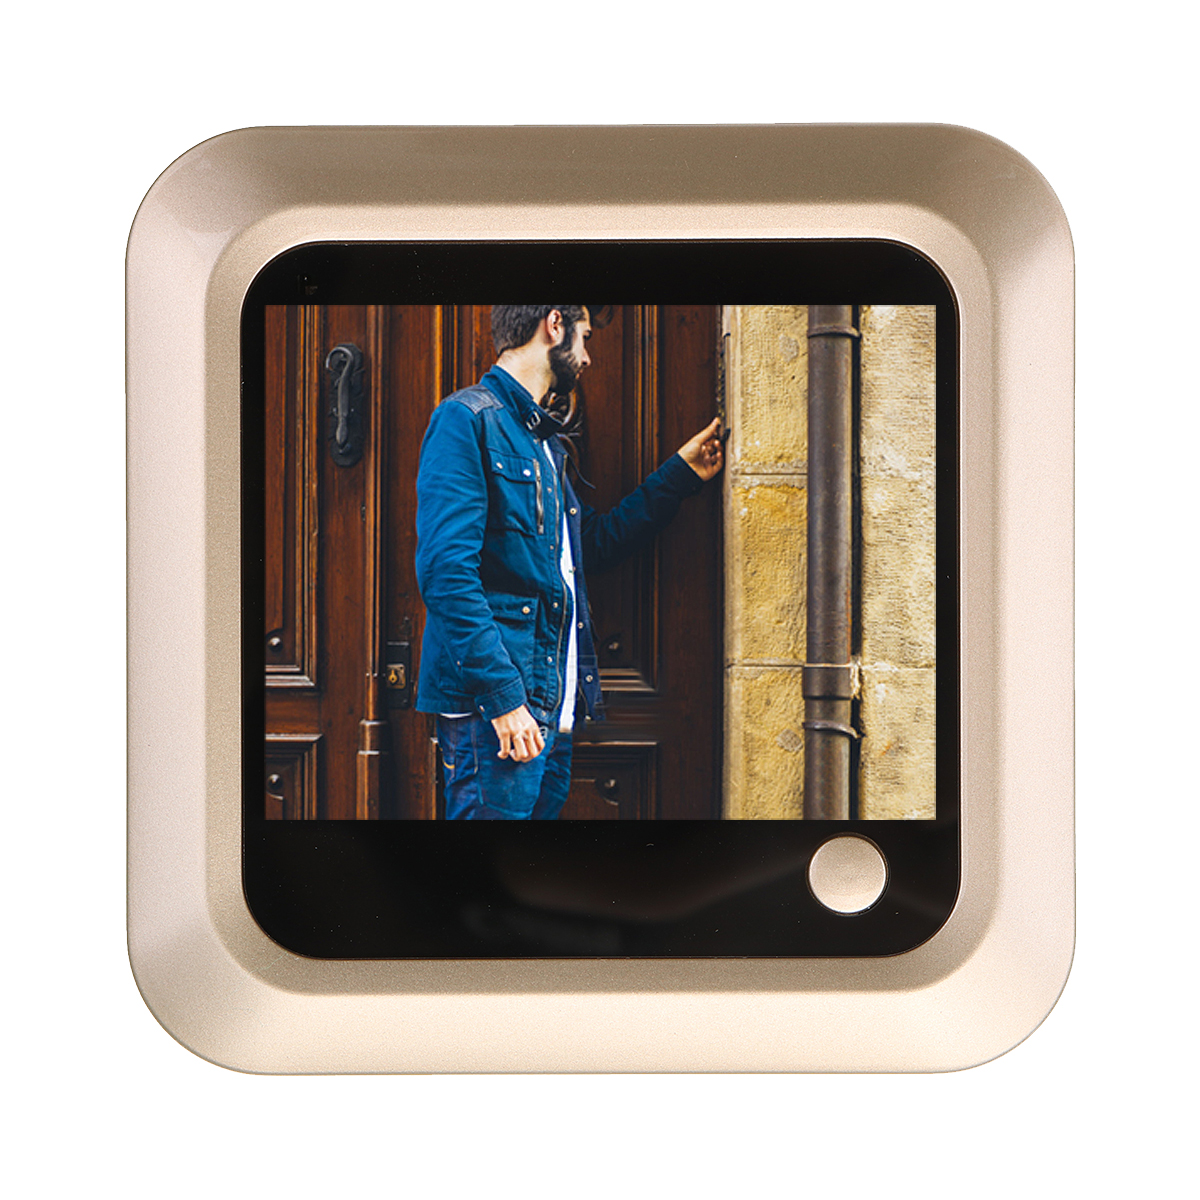 Digital LCD 2.4inch Video Doorbell Peephole Viewer Door Eye Monitoring Camera 160 Degree